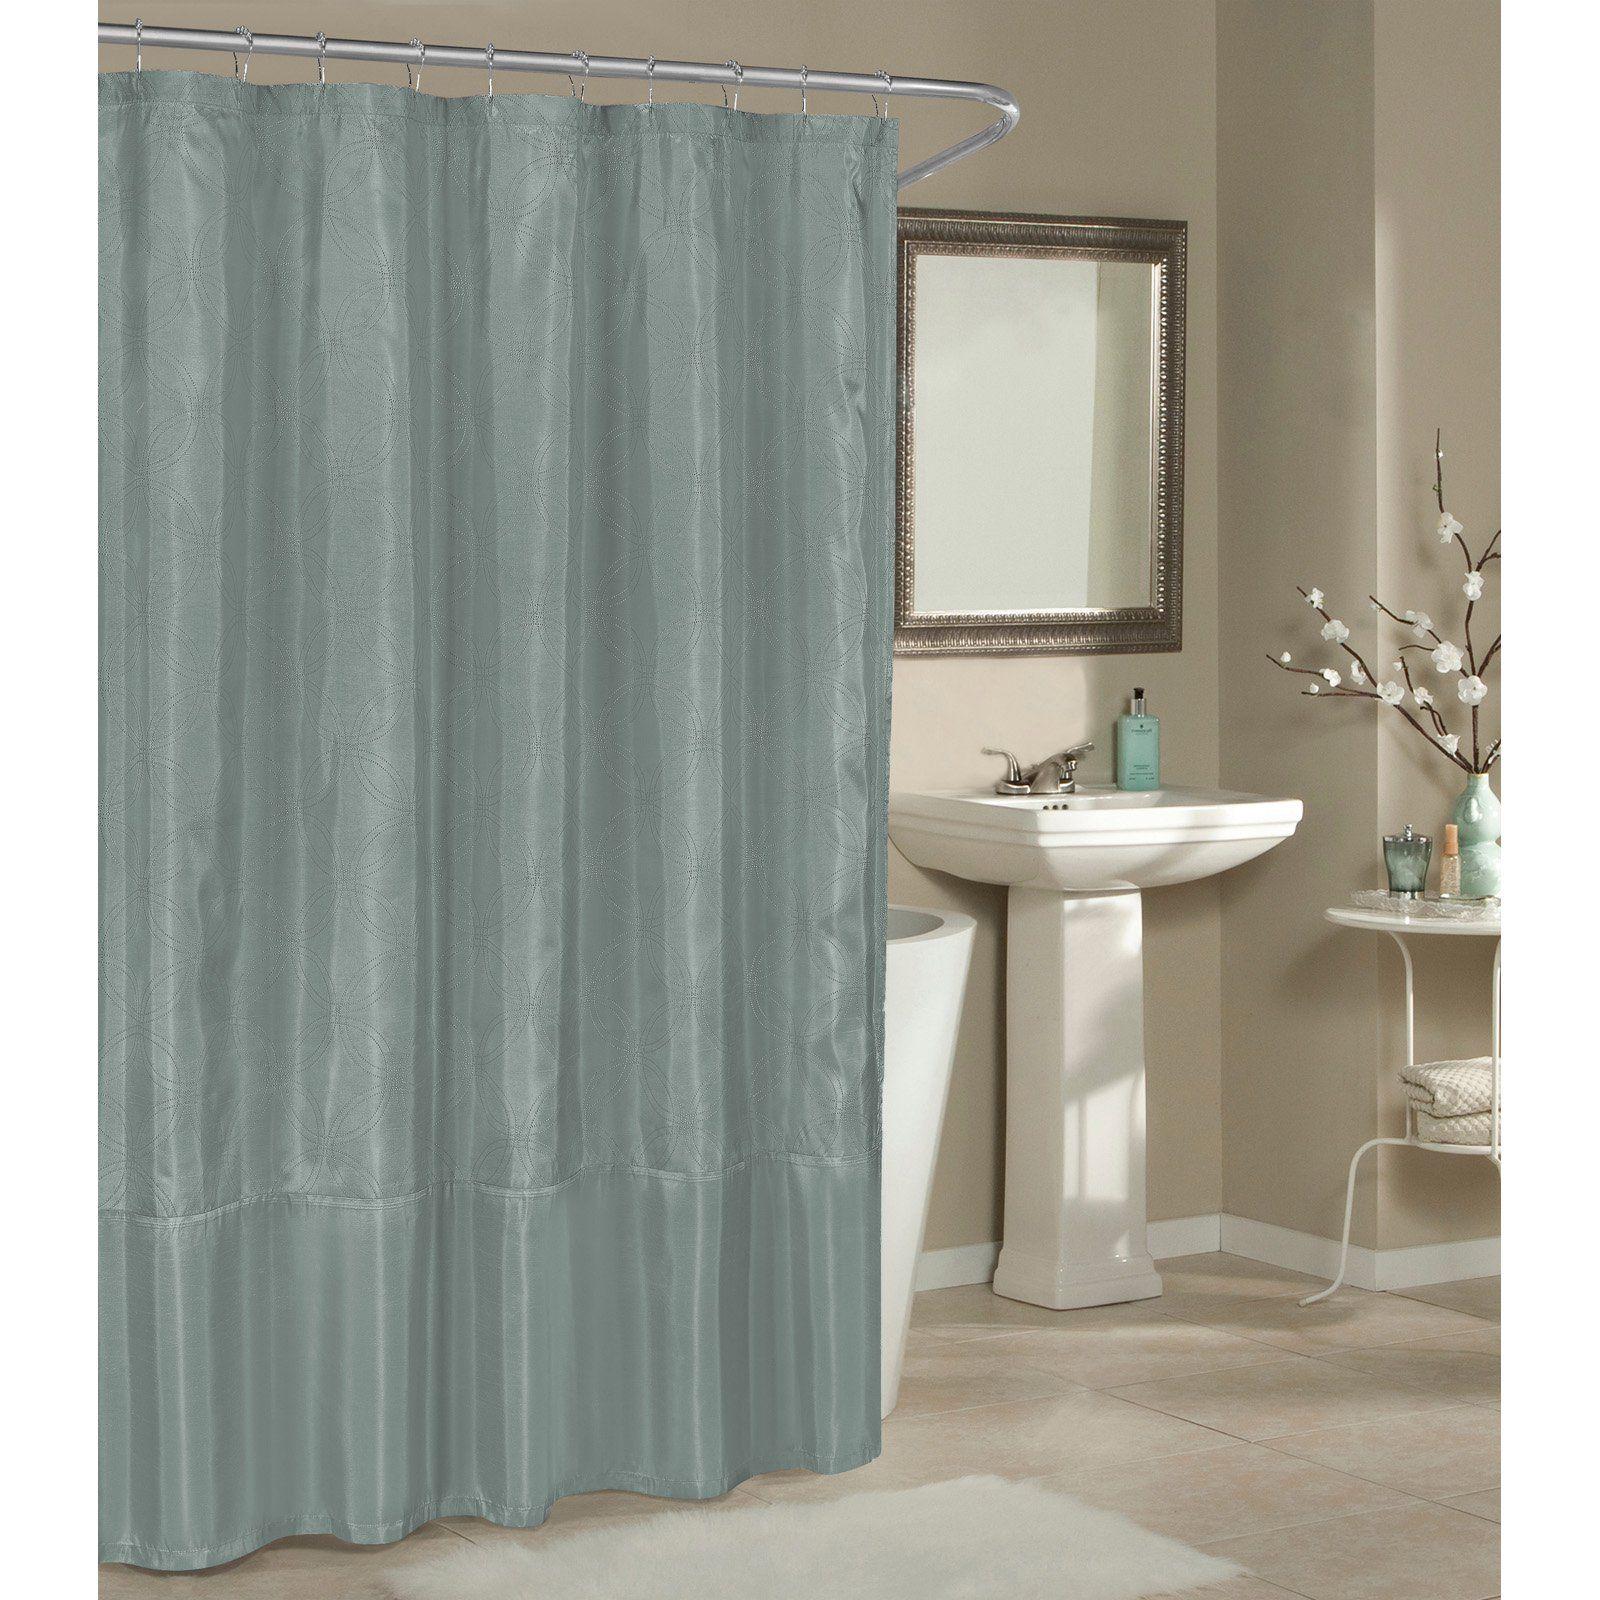 Duck River Belle Shower Curtain Spa Blue Silver Shower Curtain